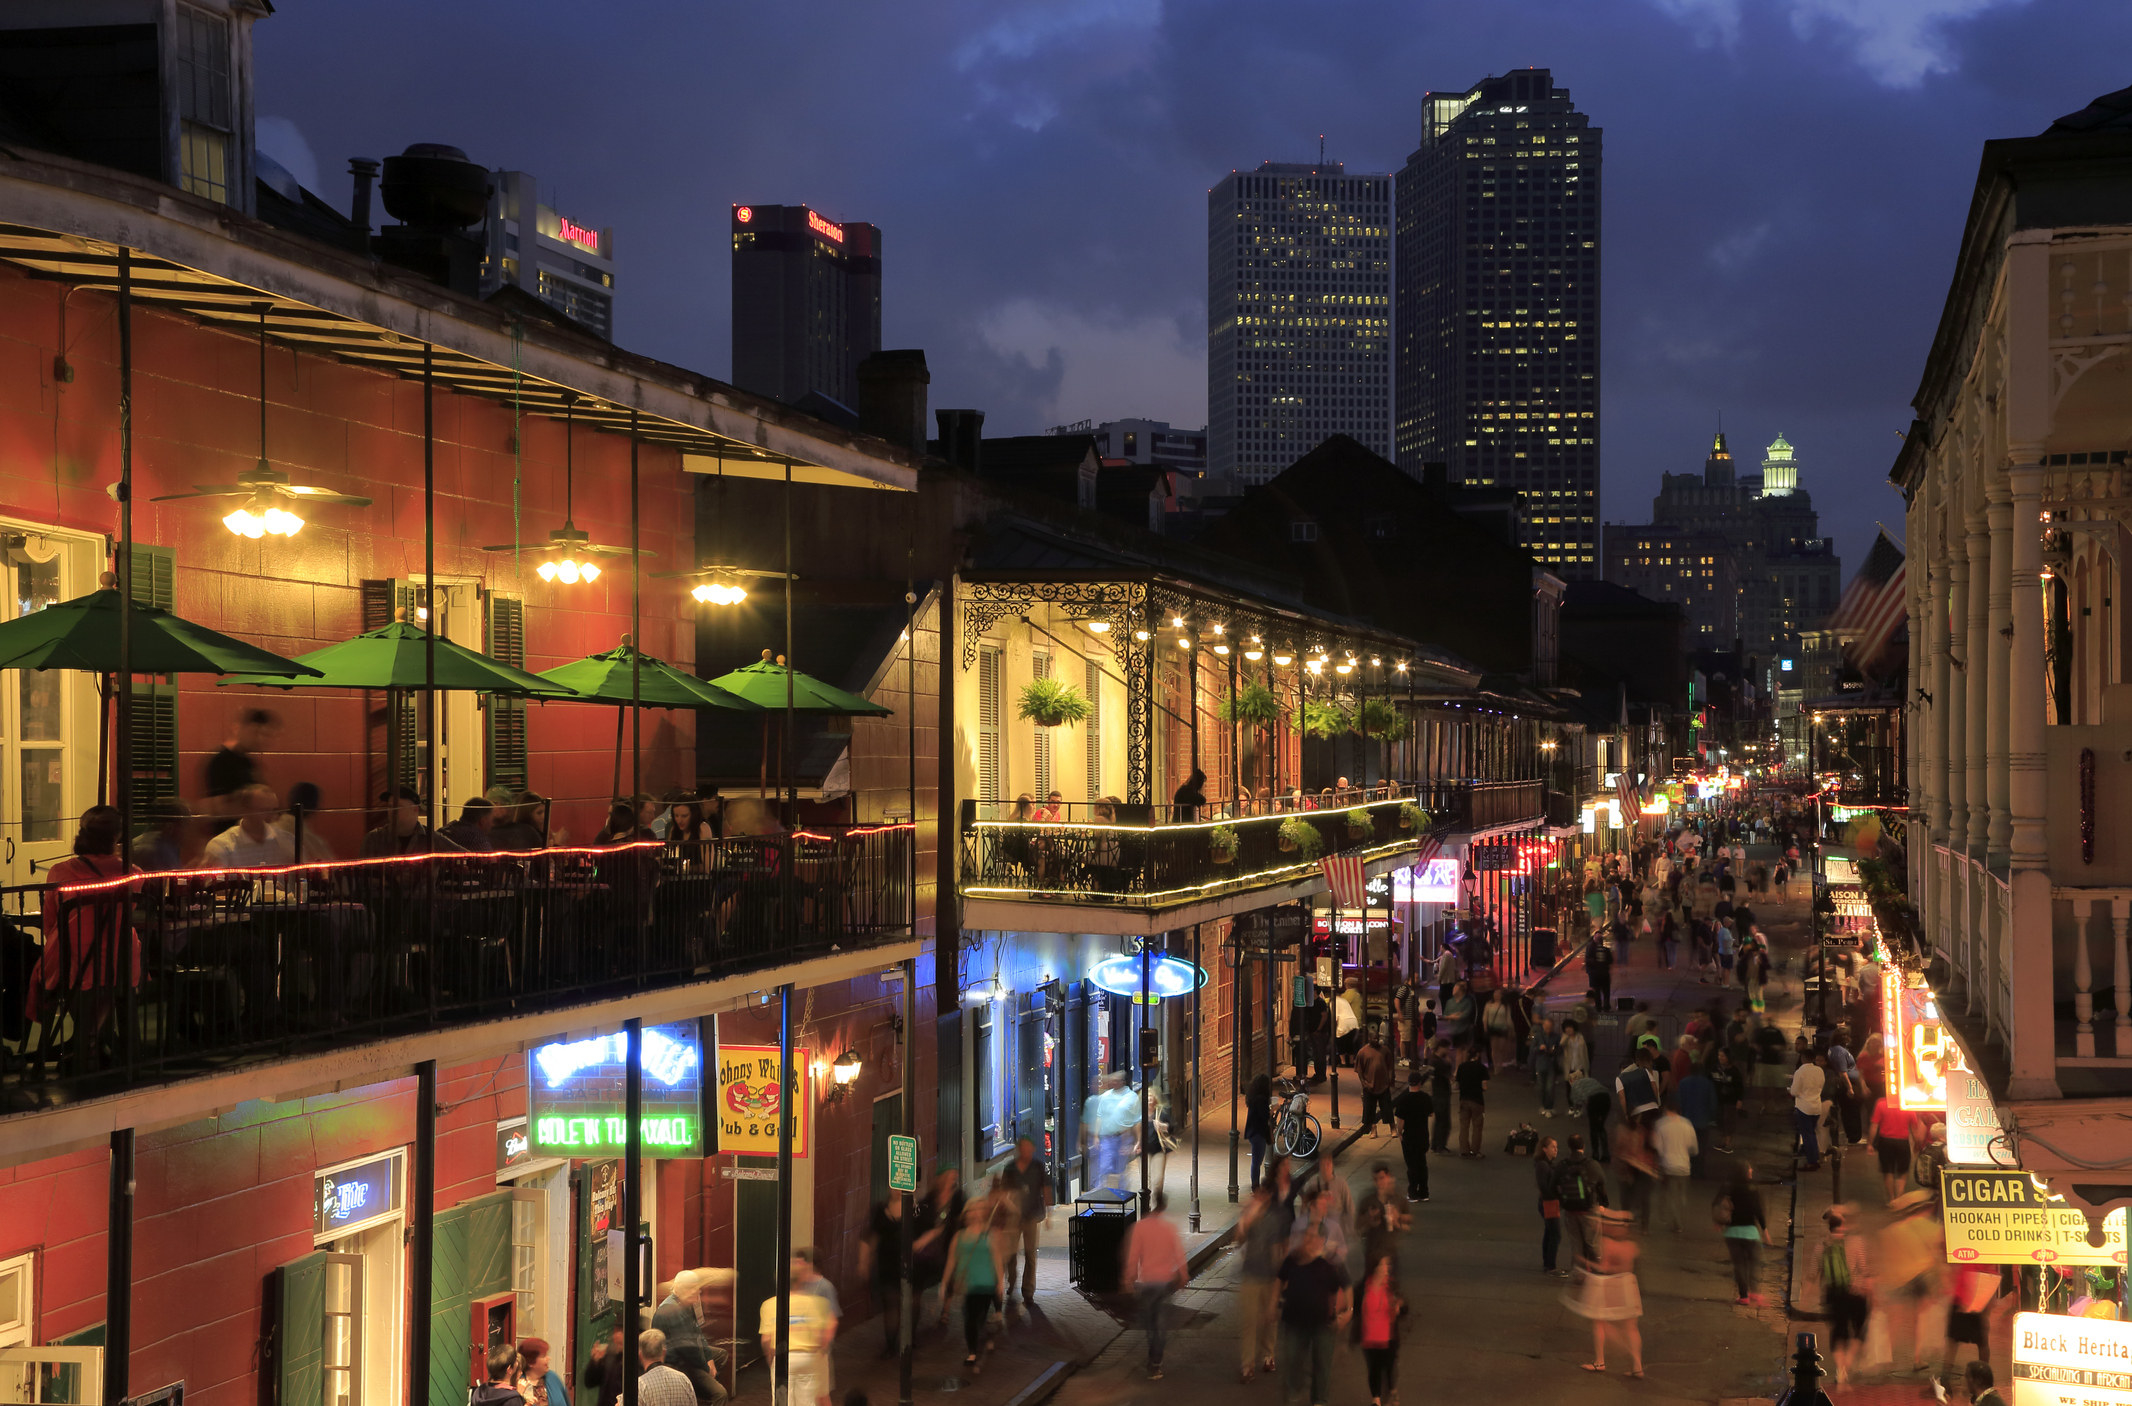 Bourbon Street at night.